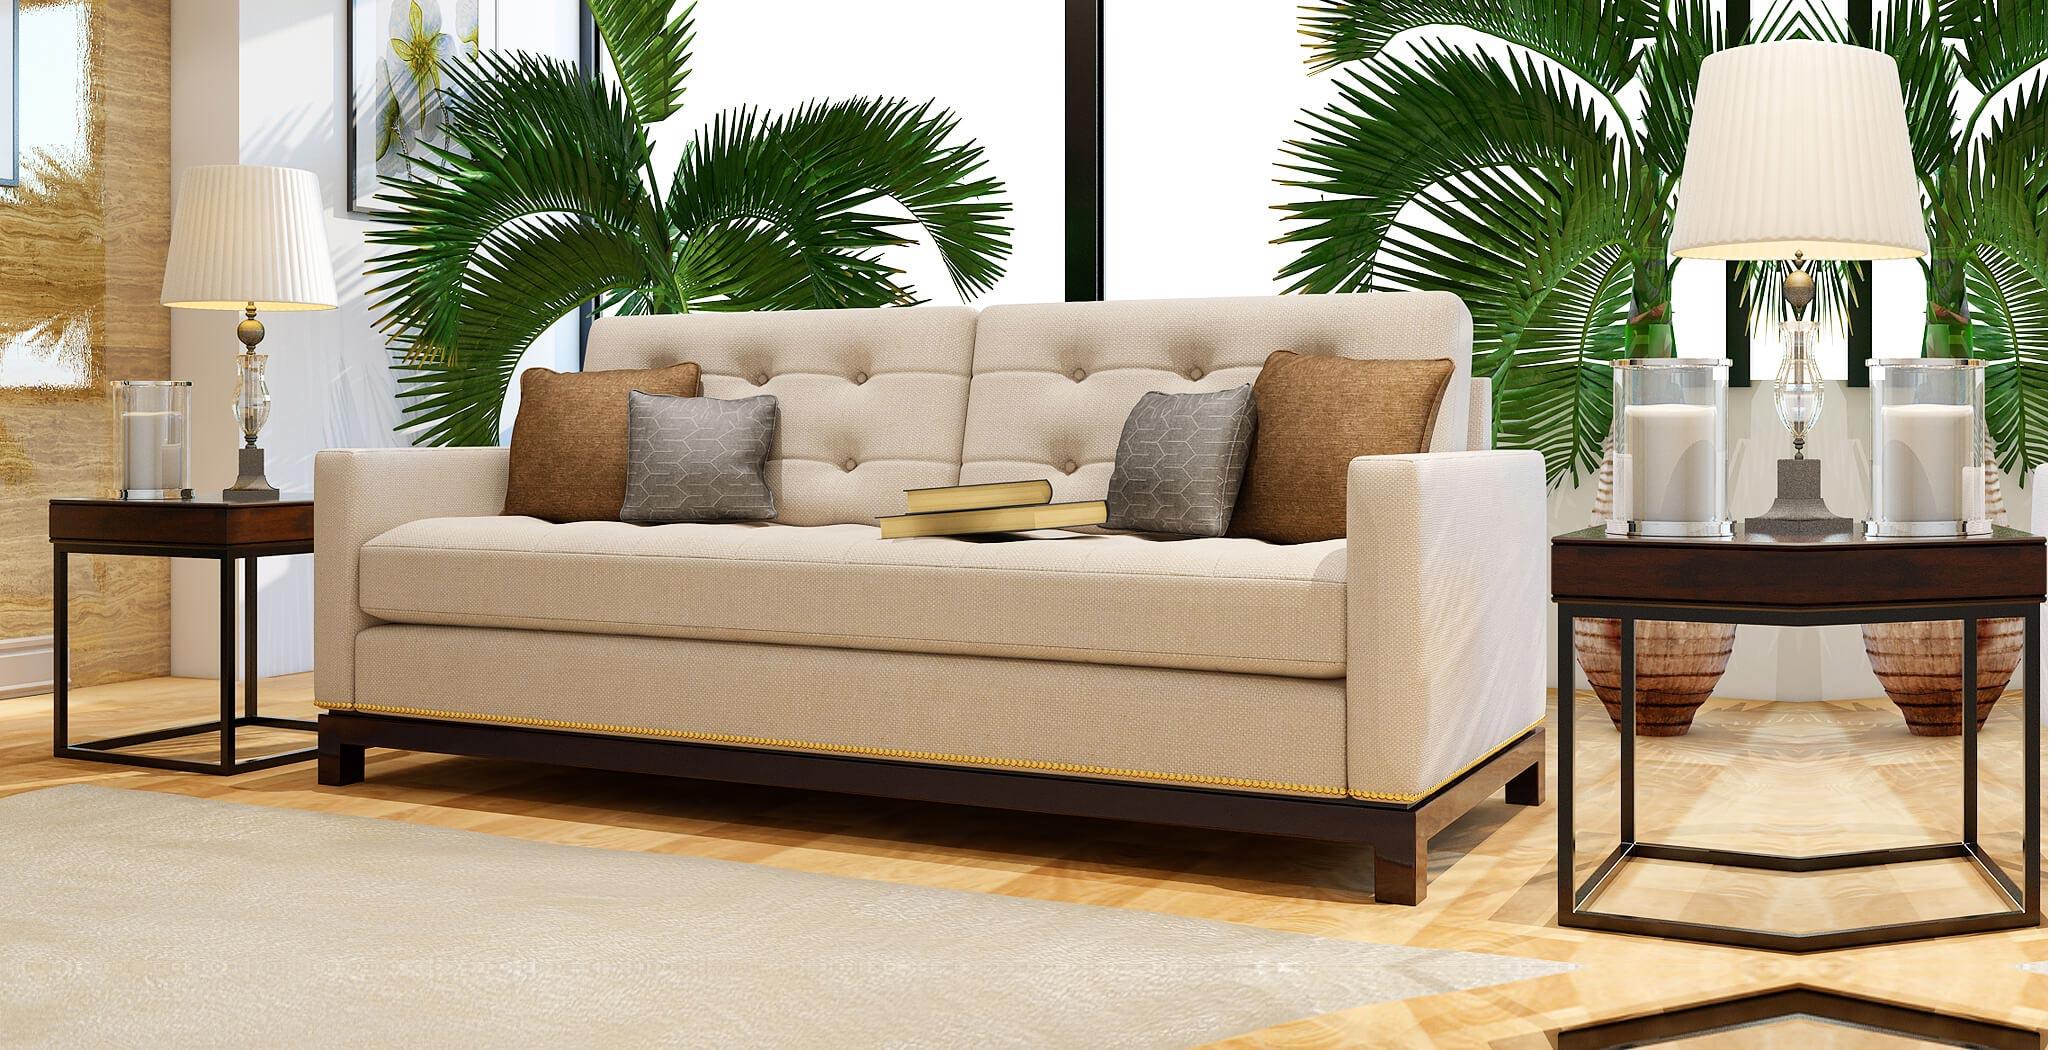 davos sofa furniture gallery 1